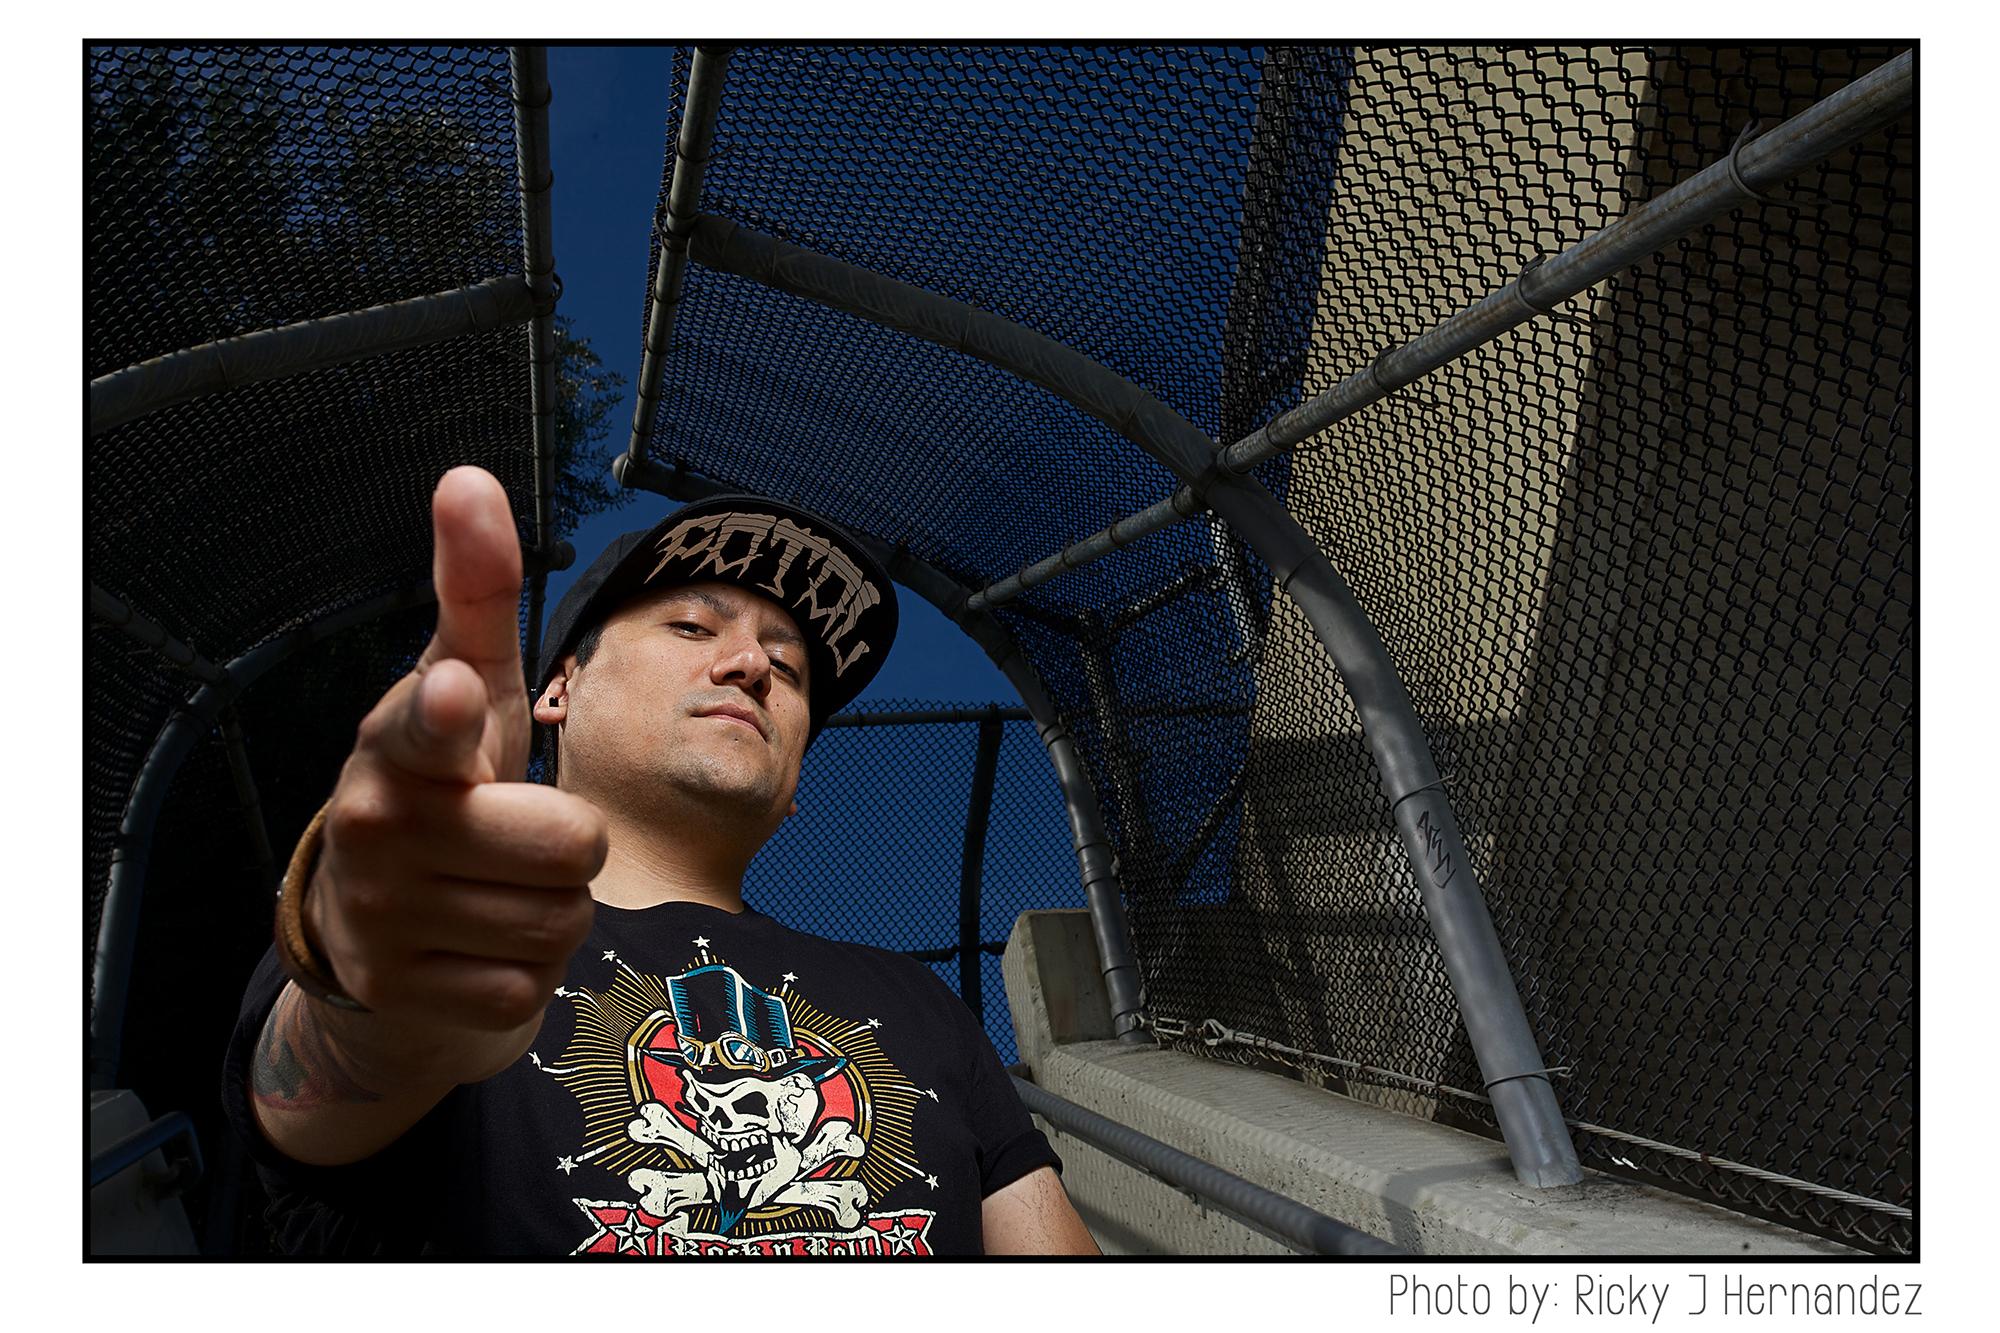 Photos for a tattoo magazine. Portraits of artist Rebel Hernandez. Tattoo & airbrush artist.